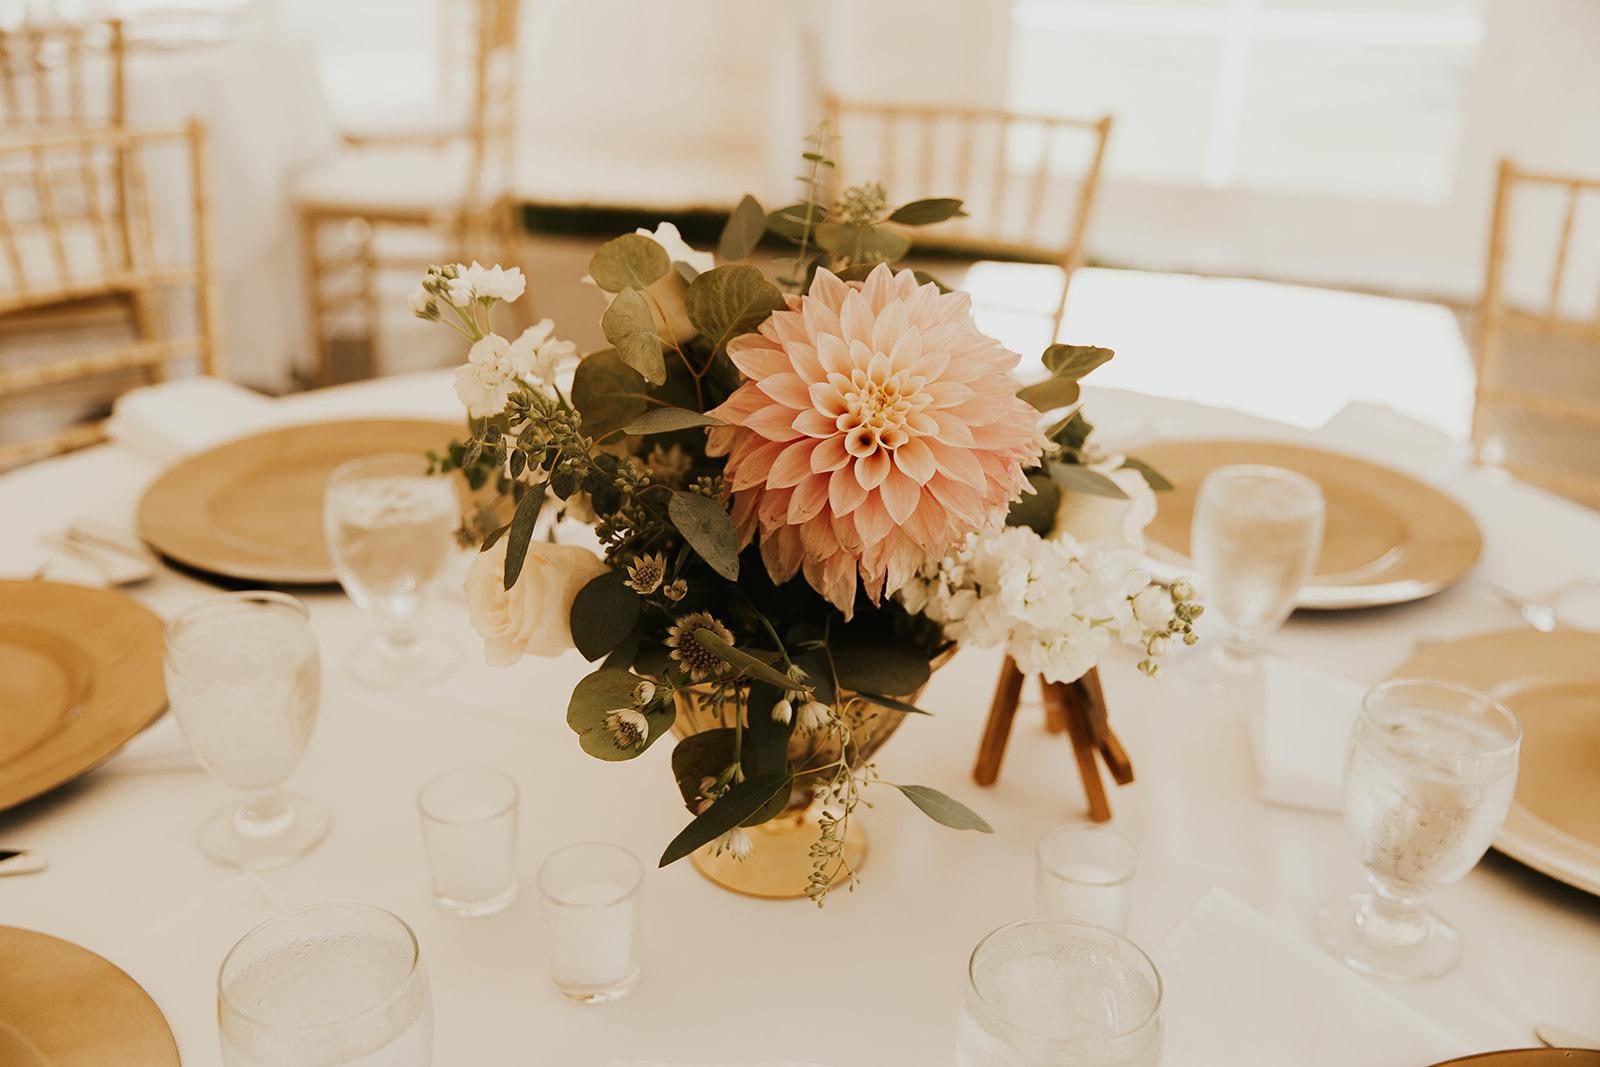 cafe au lait dahlia, classic wedding flowers, eucalyptus, gold, ivory, blush flowers, urn centerpieces